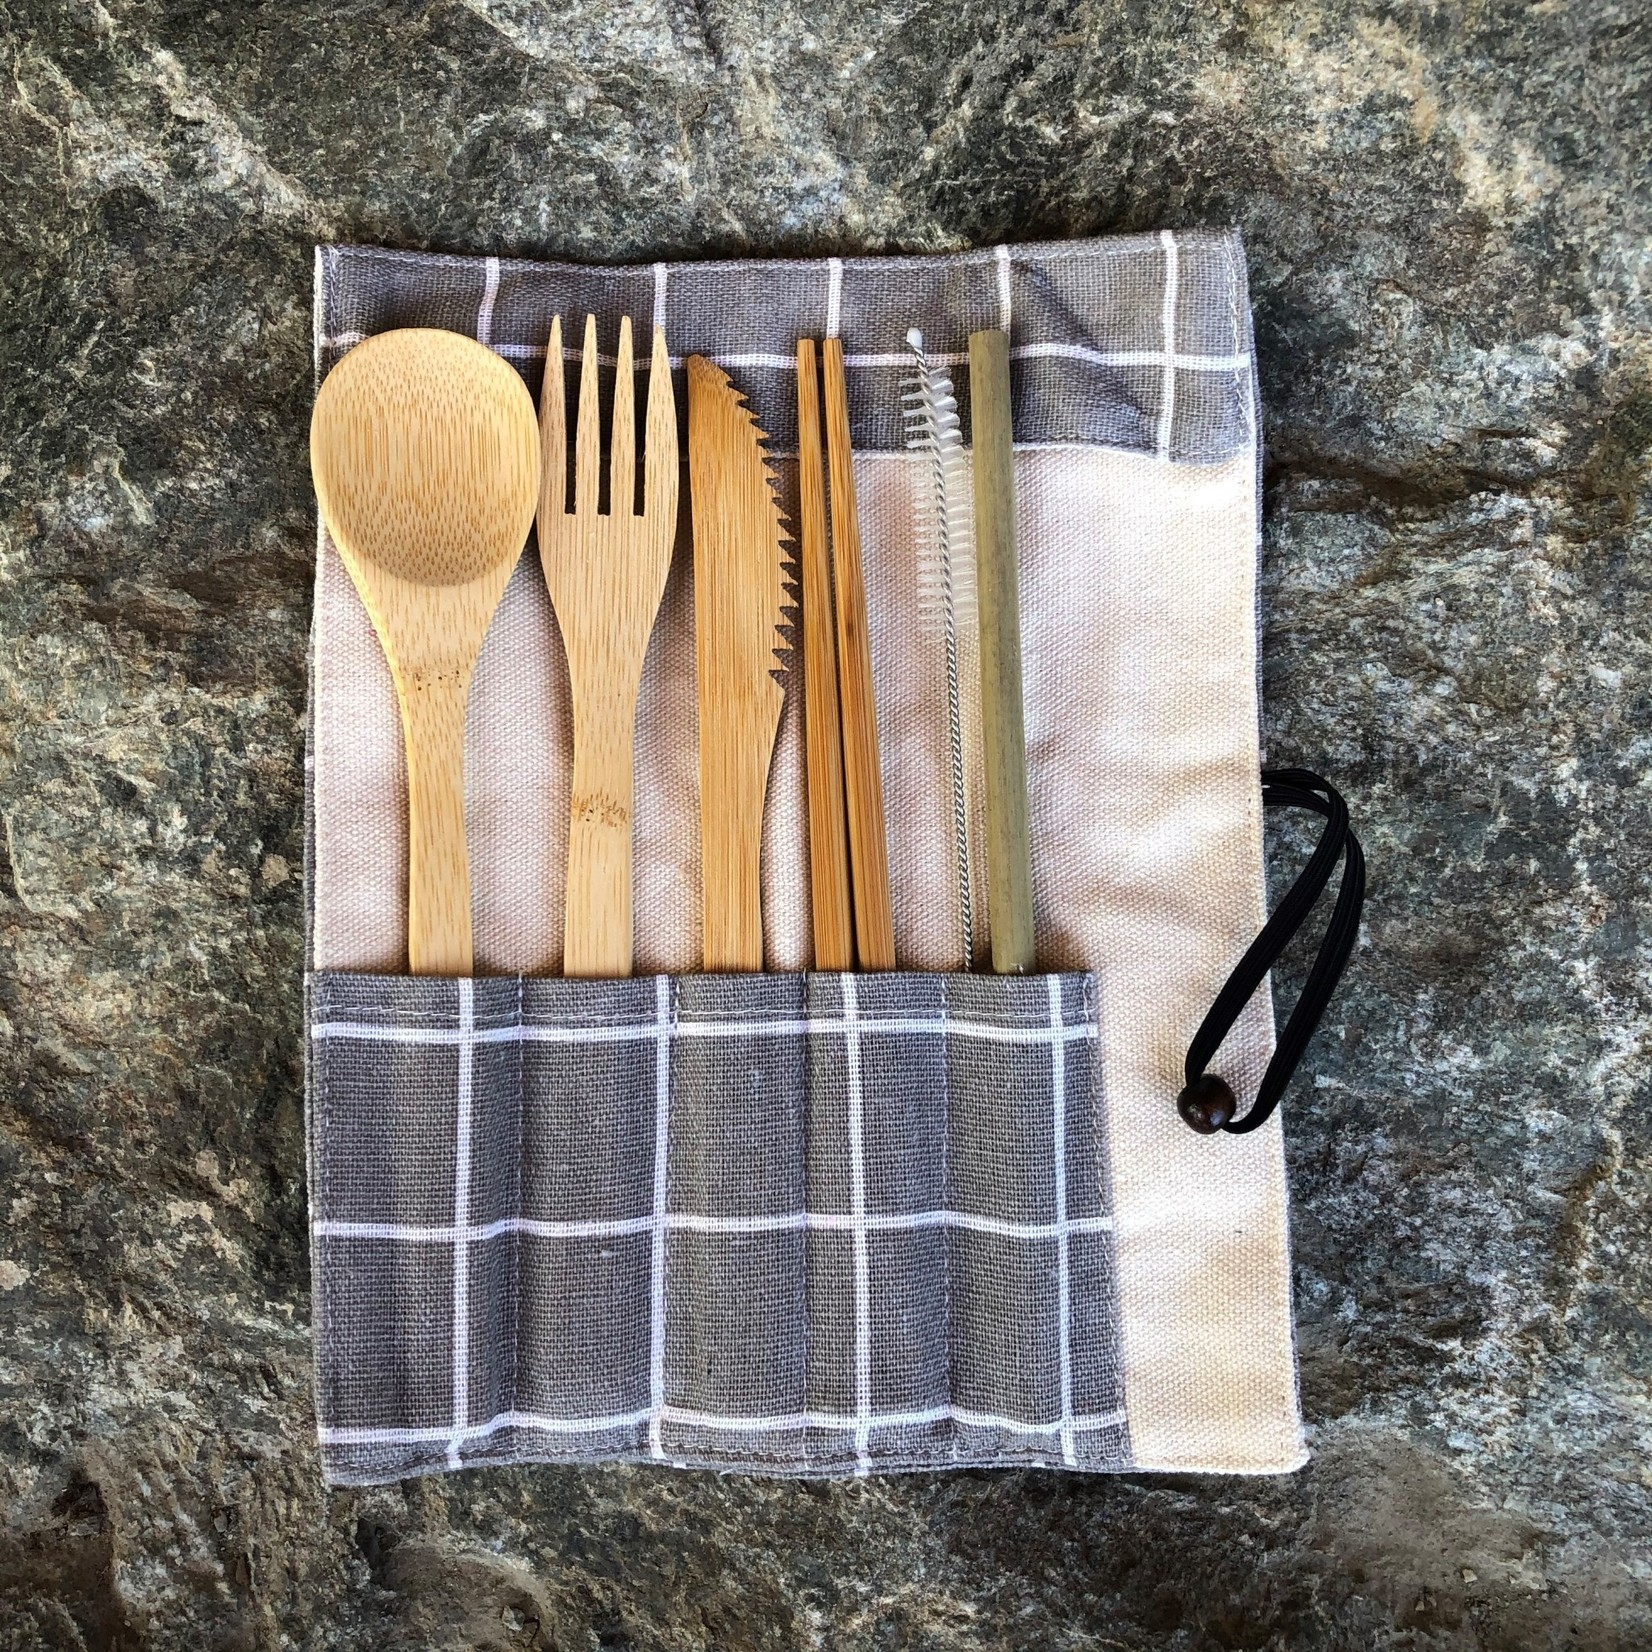 Tourism Tofino Bamboo Cutlery Set